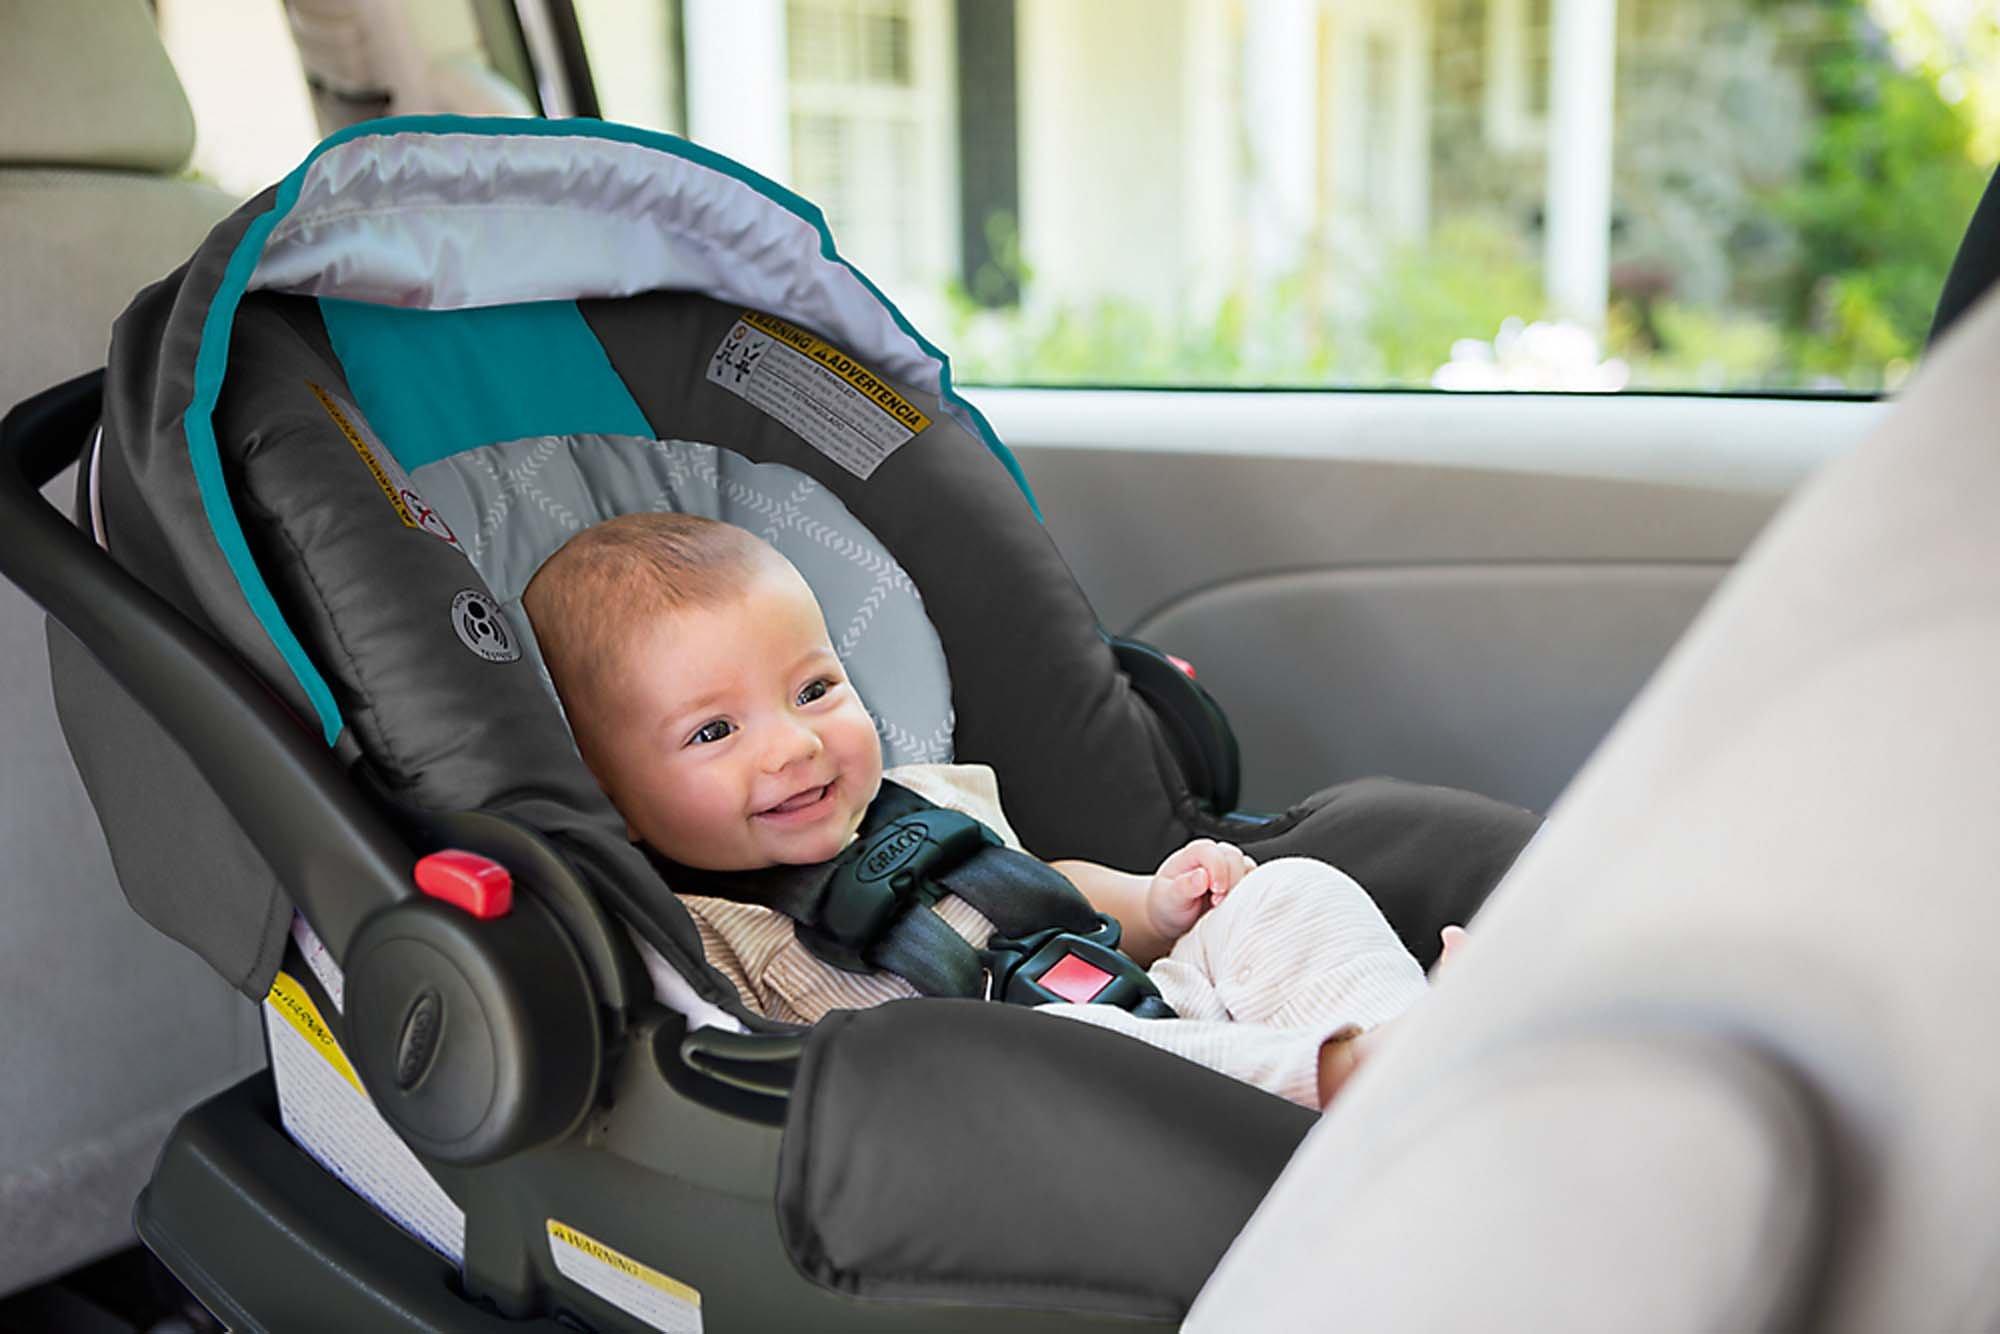 Graco SnugRide Click Connect 30 Infant Car Seat, Finch - 1965899 ...